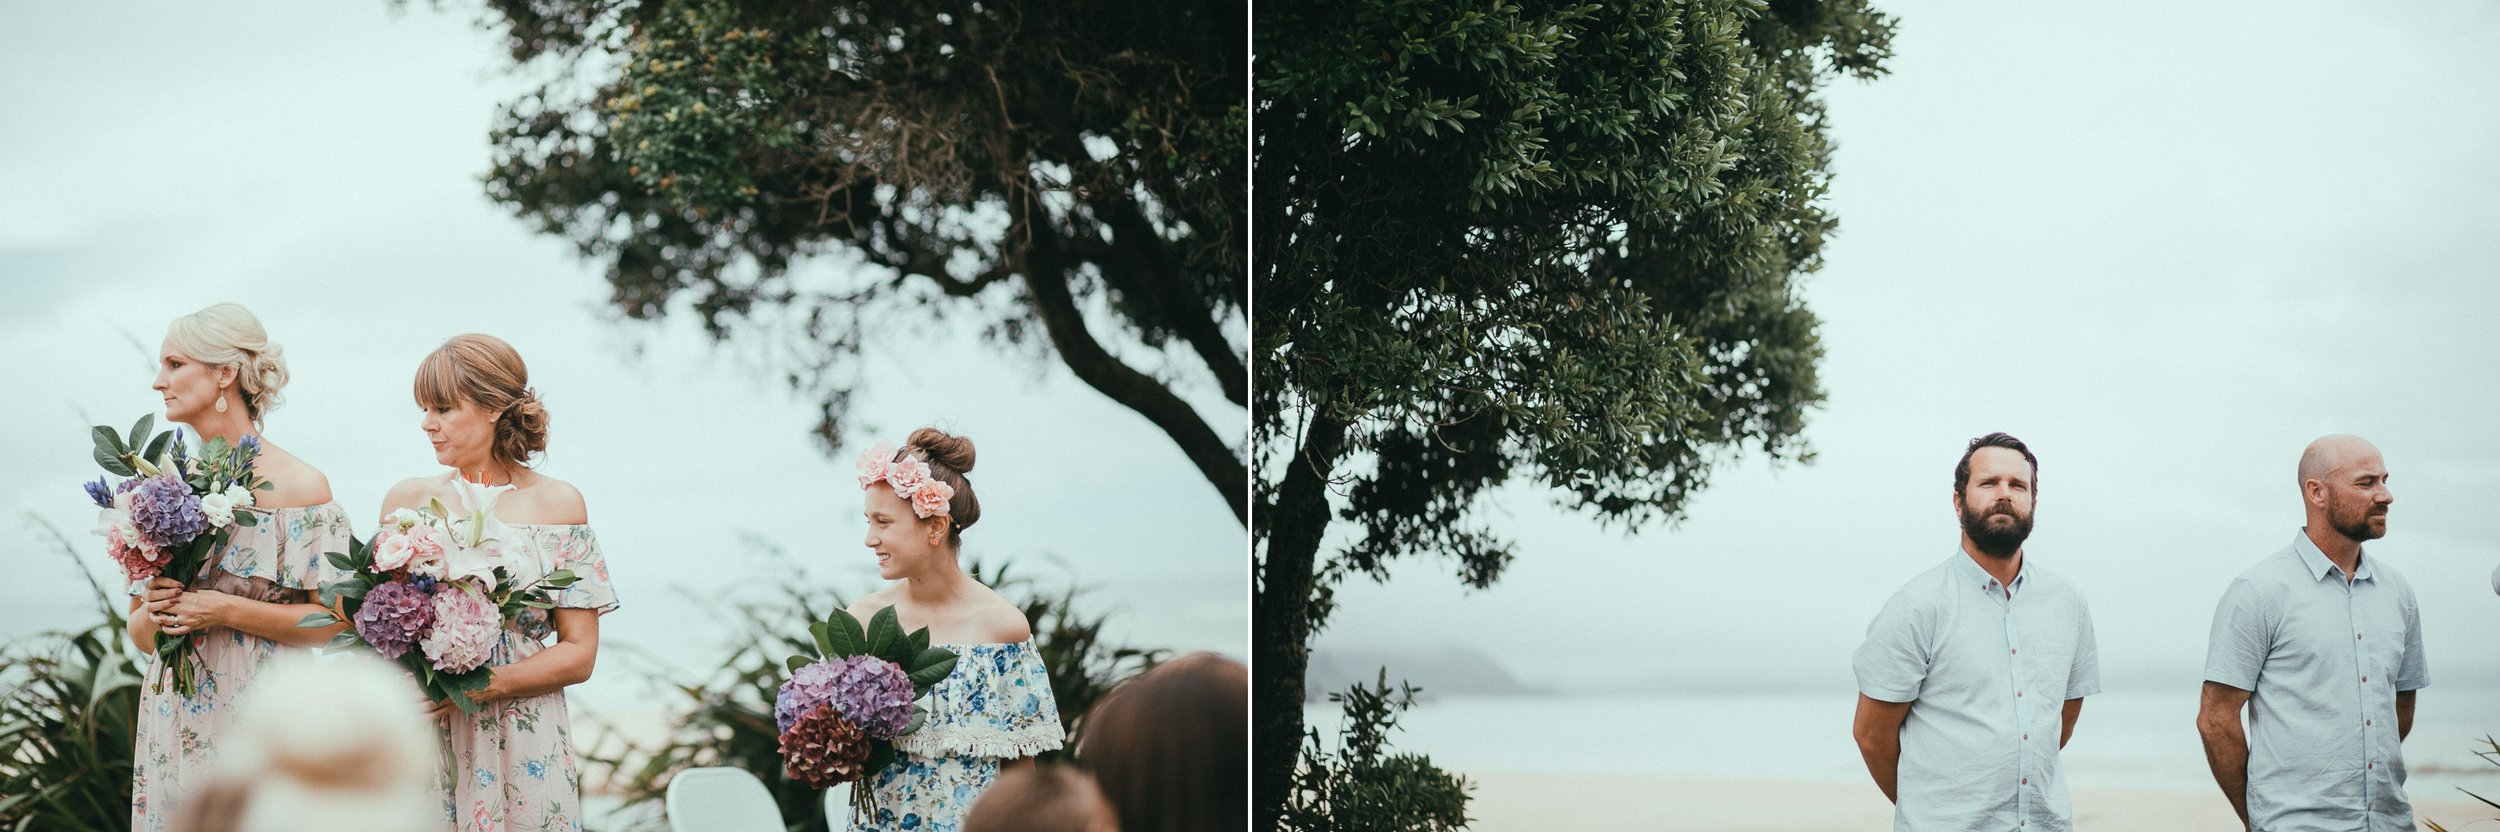 emotional-wedding-new-zealand71.jpg